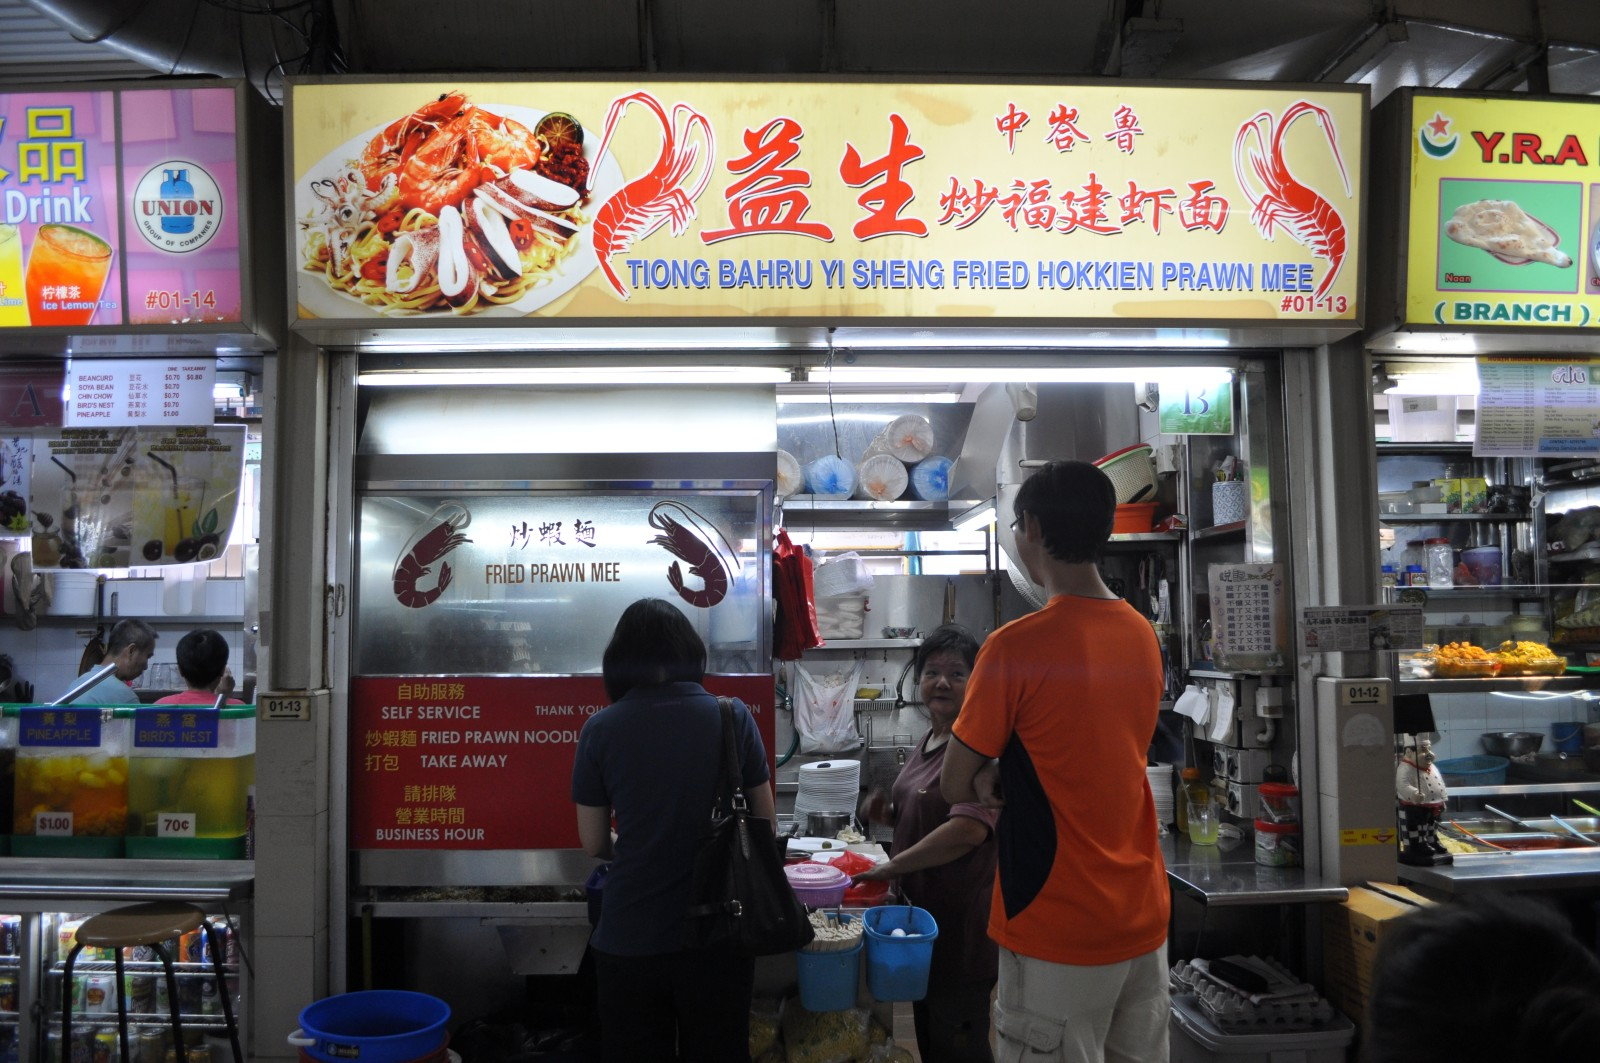 Tiong Bahru Yi Sheng Fried Hokkien Mee (中峇鲁益生炒福建虾面).JPG